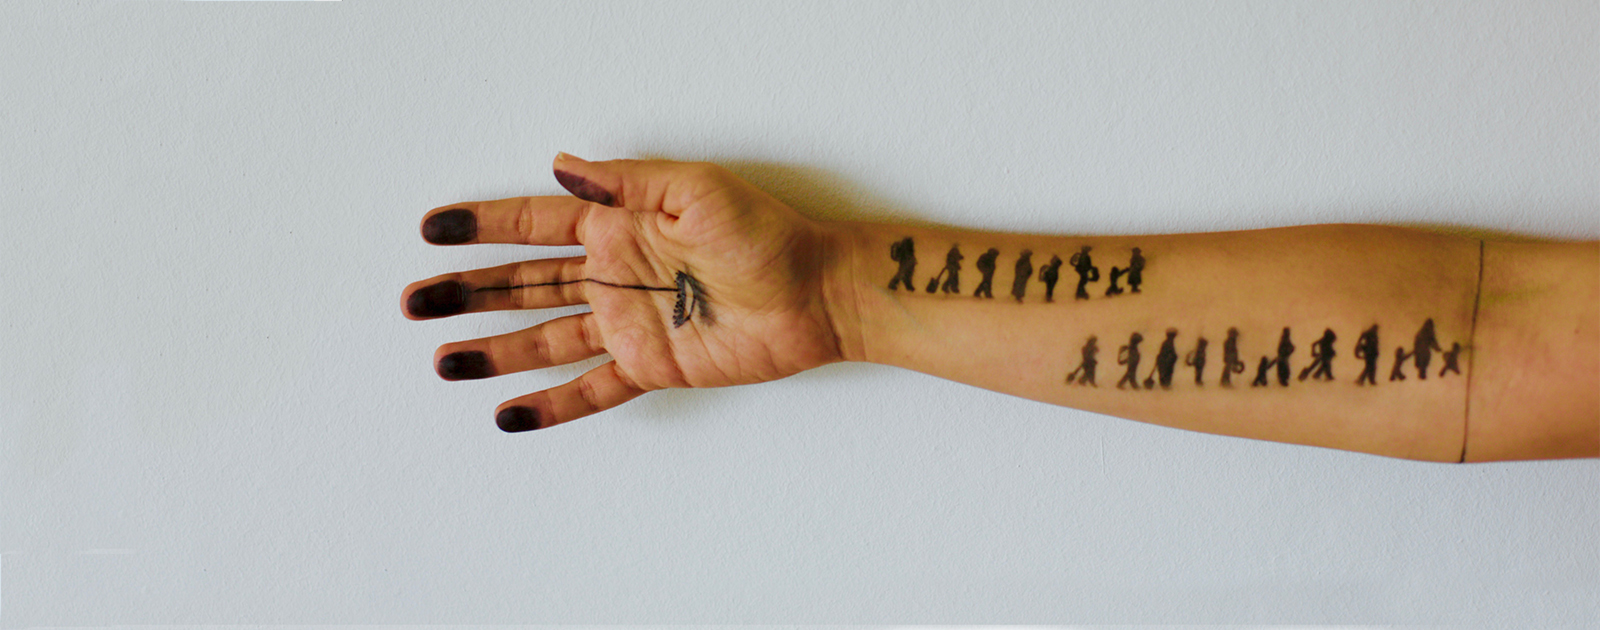 As Far As My Fingertips Take Me